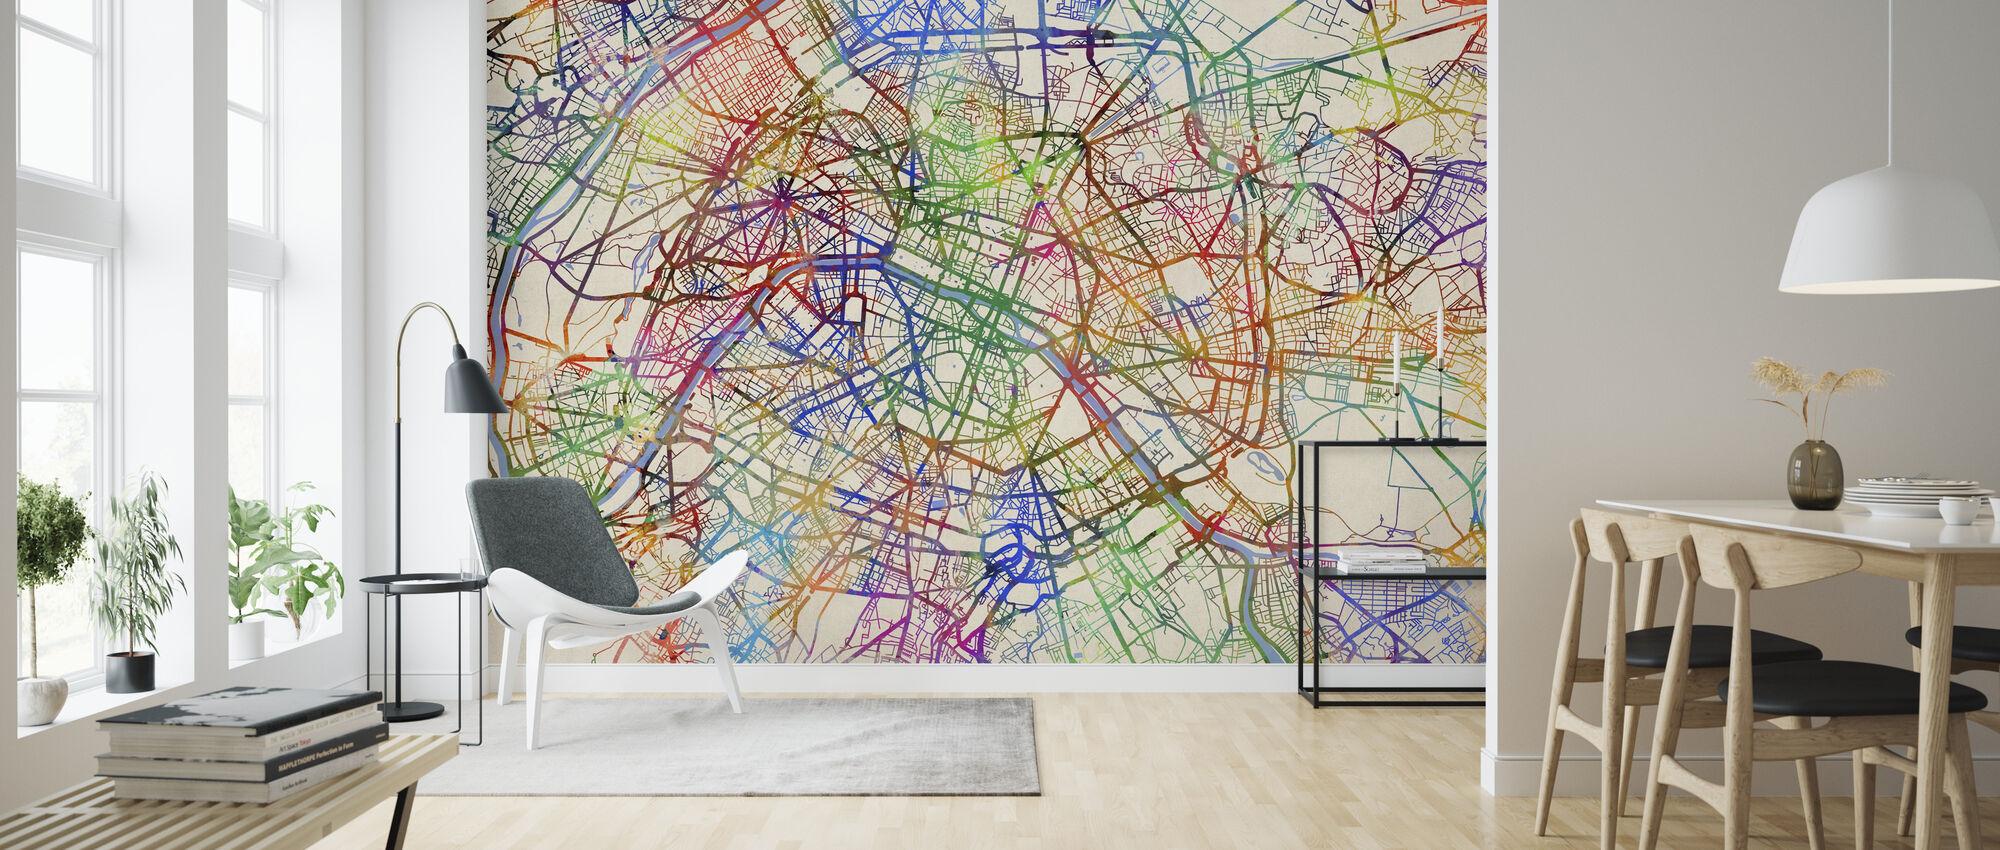 Paris France Street Map - Wallpaper - Living Room